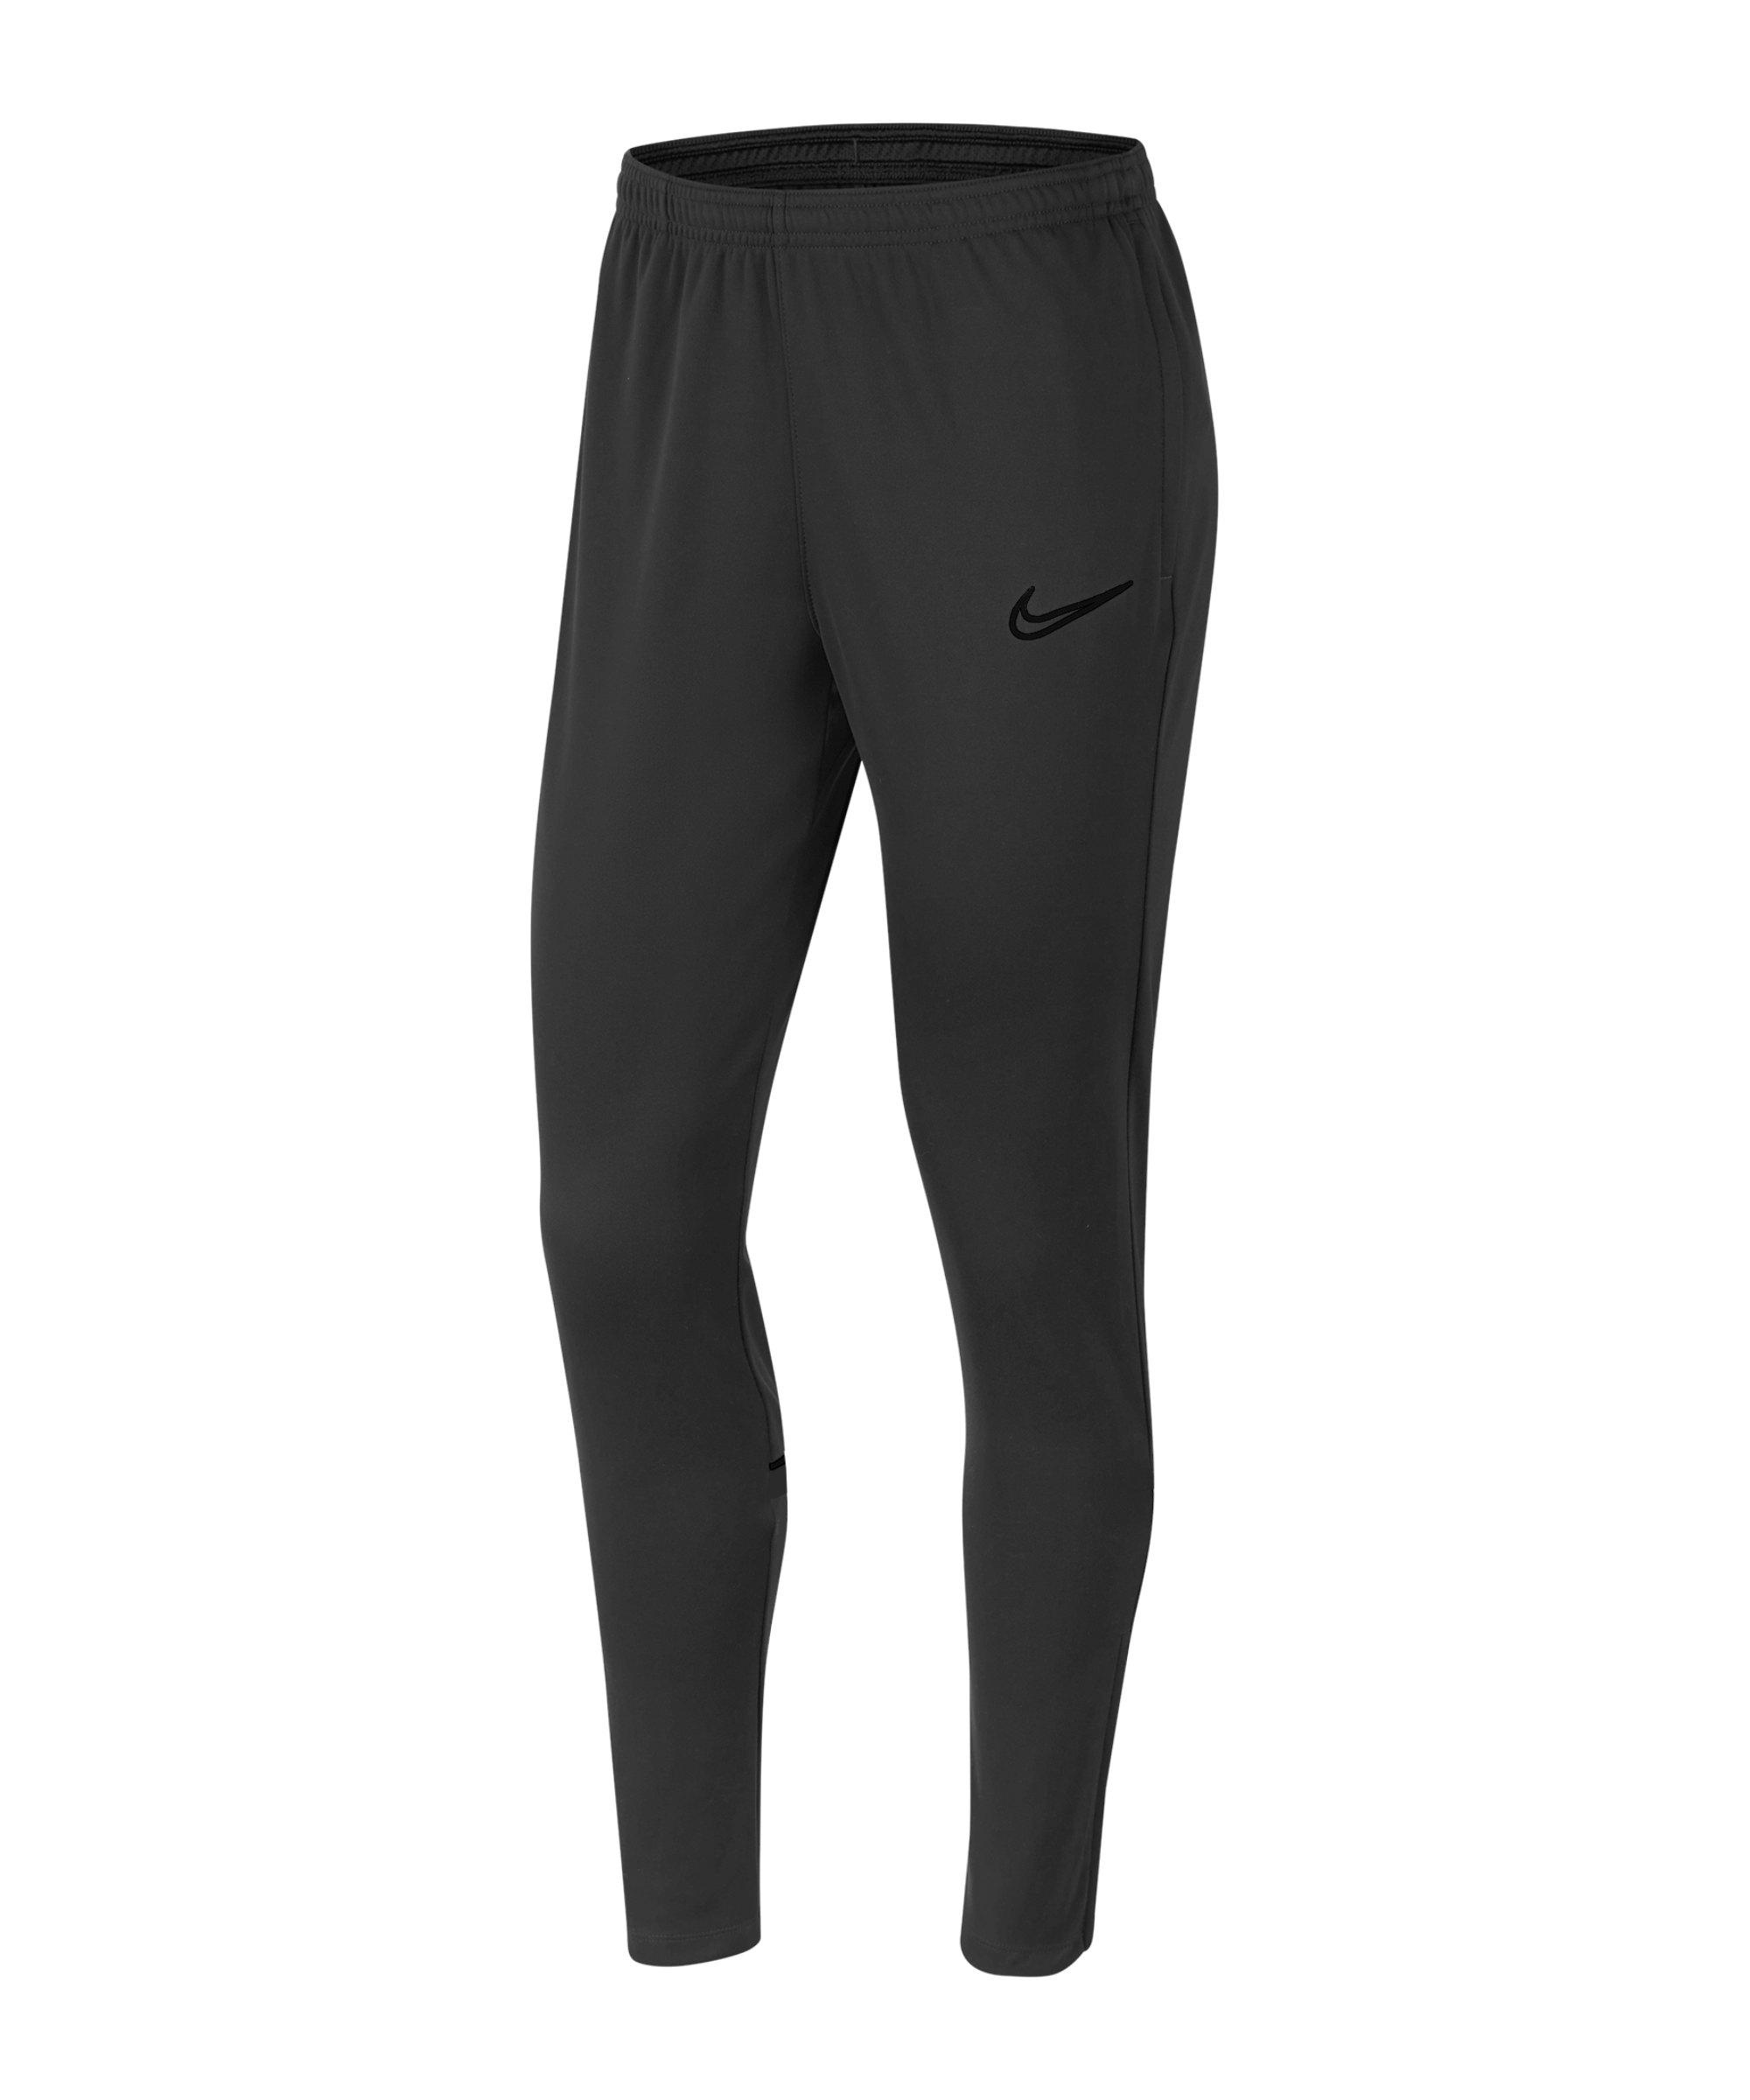 Nike Academy 21 Trainingshose Damen Grau F060 - grau